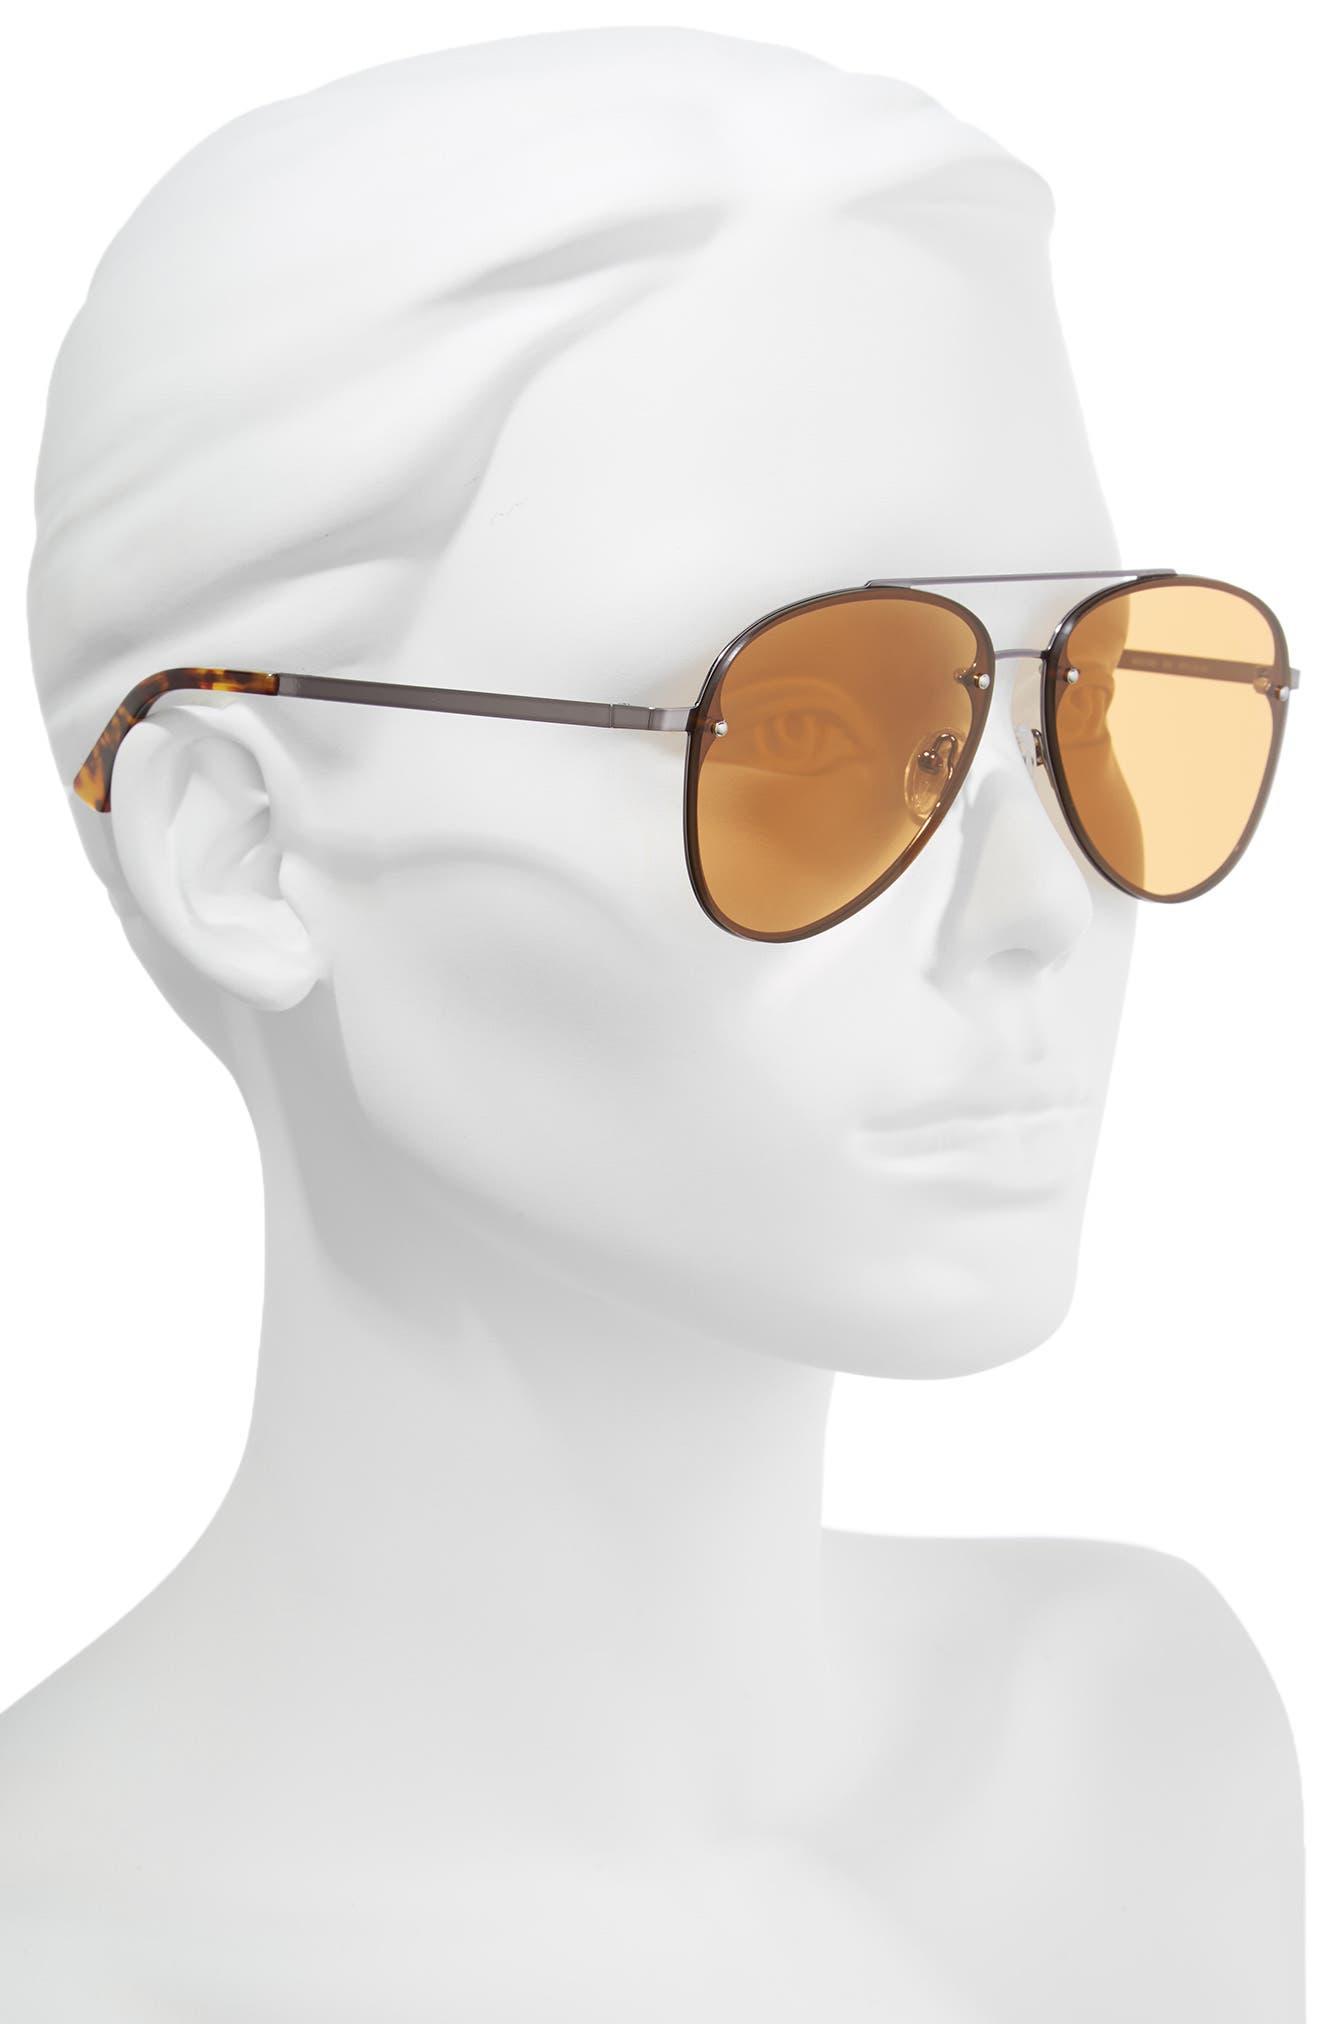 59mm Aviator Sunglasses,                             Alternate thumbnail 2, color,                             RUTHENIUM